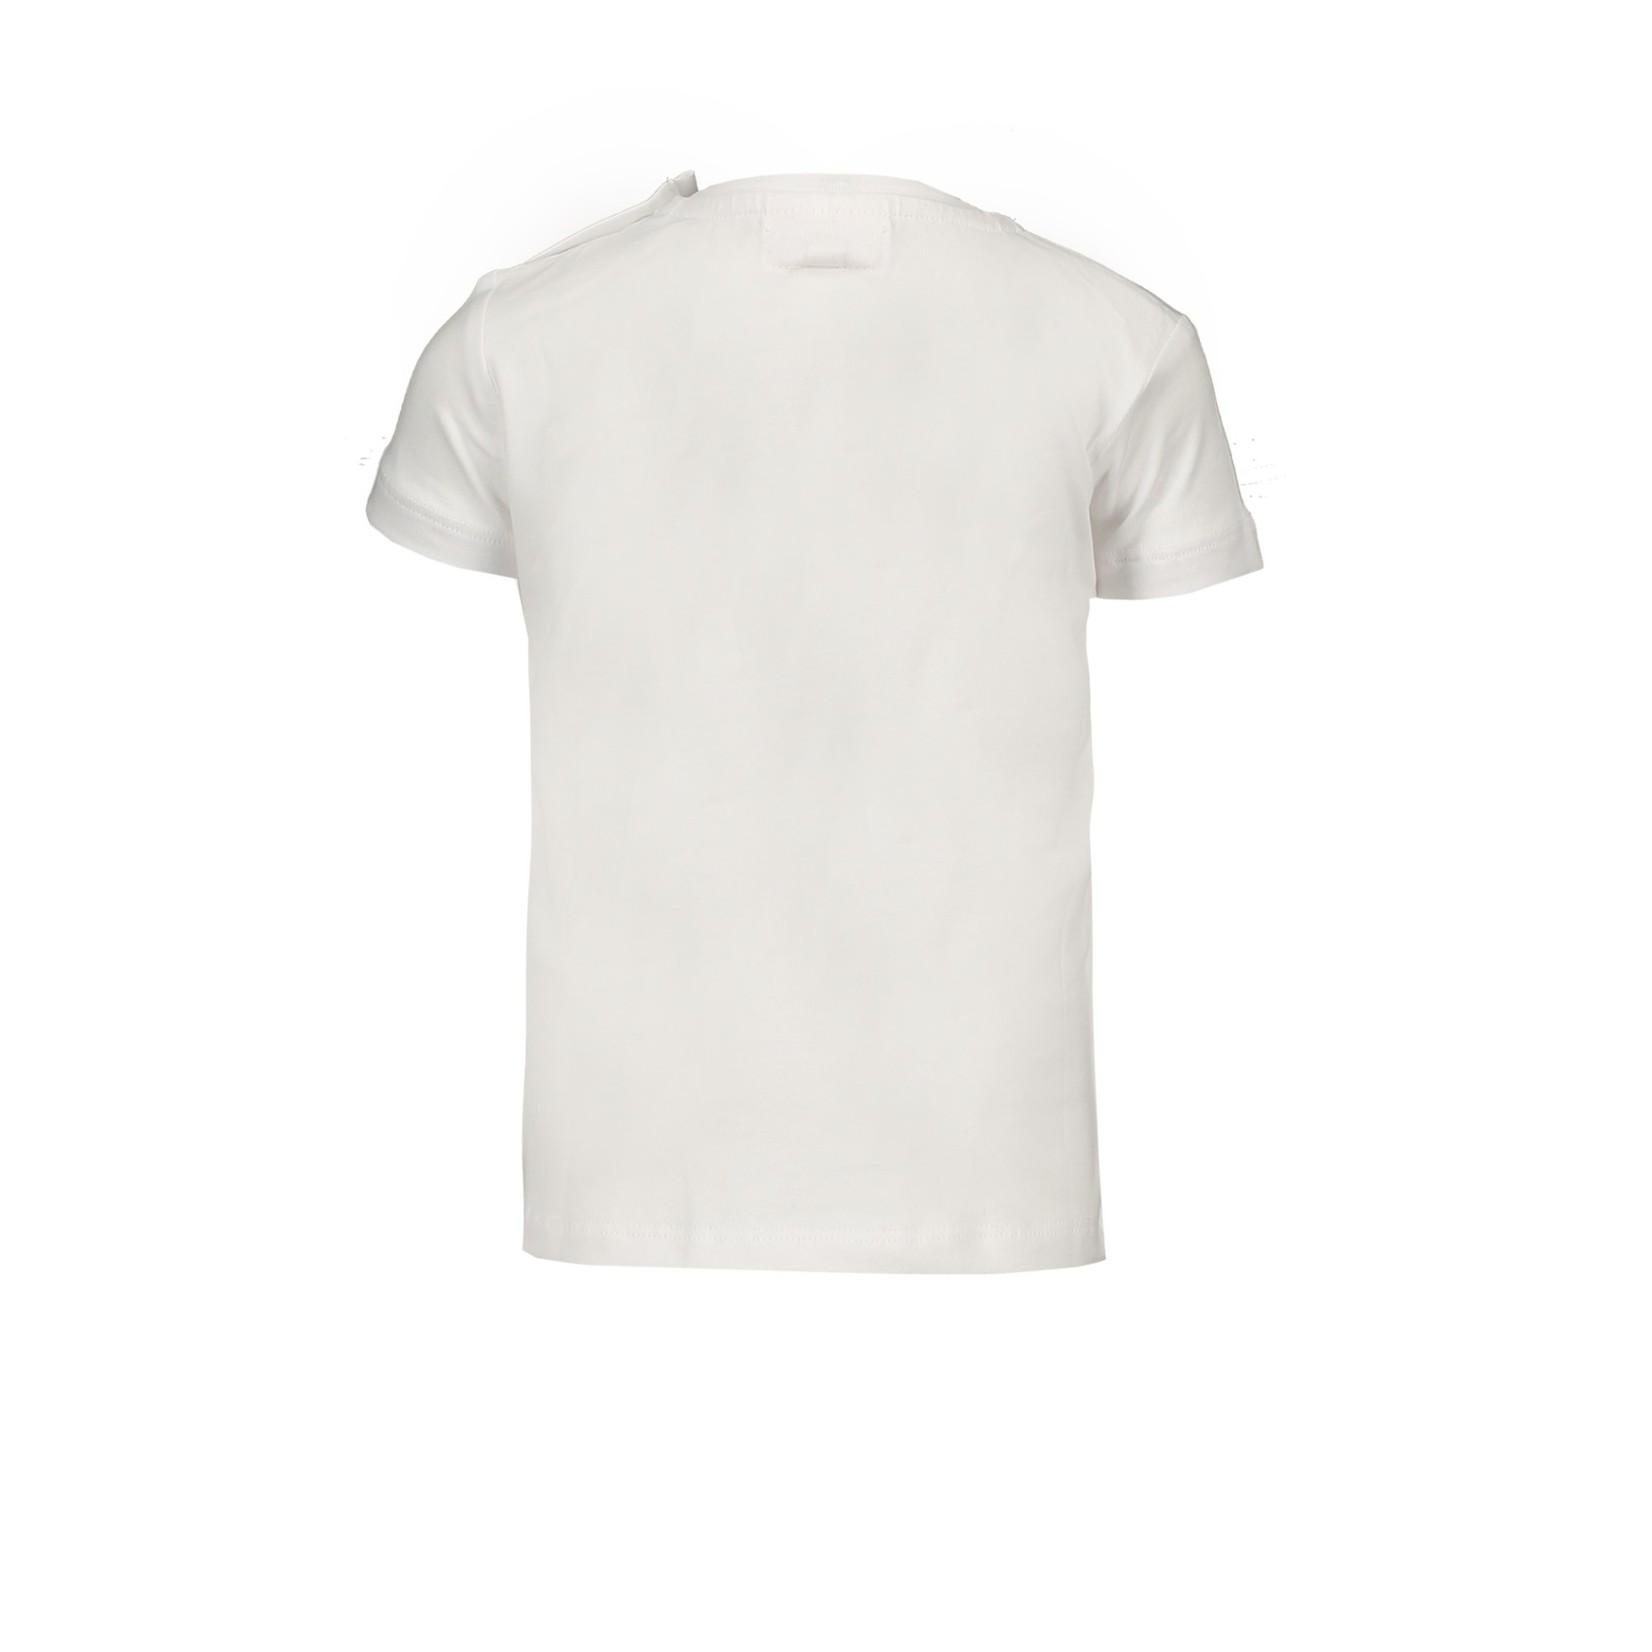 Le Chic T-shirt Sea Sand Sun